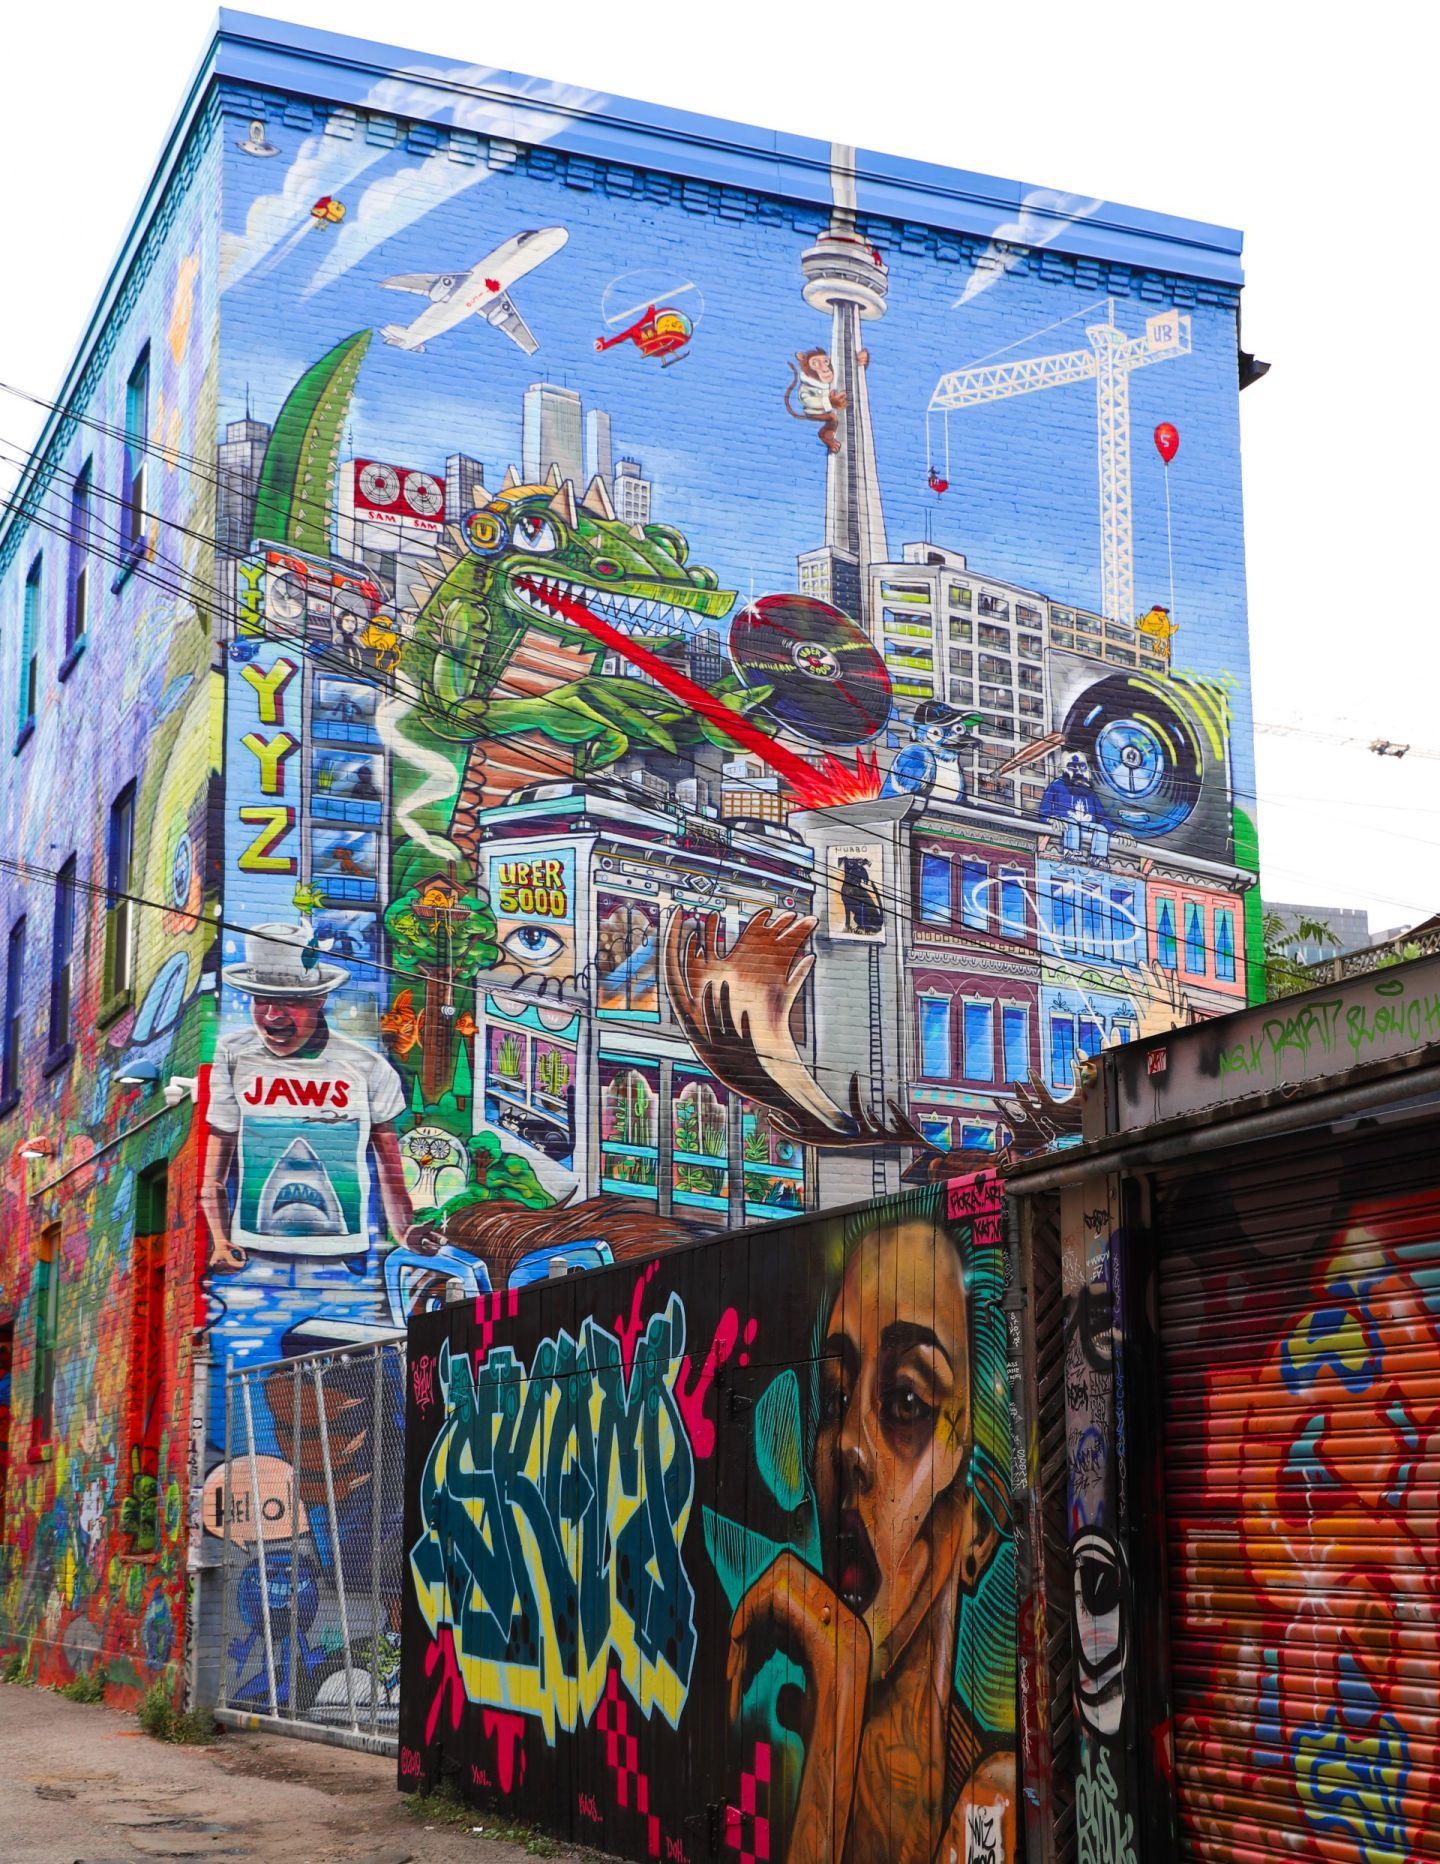 Queen st west graffiti alley